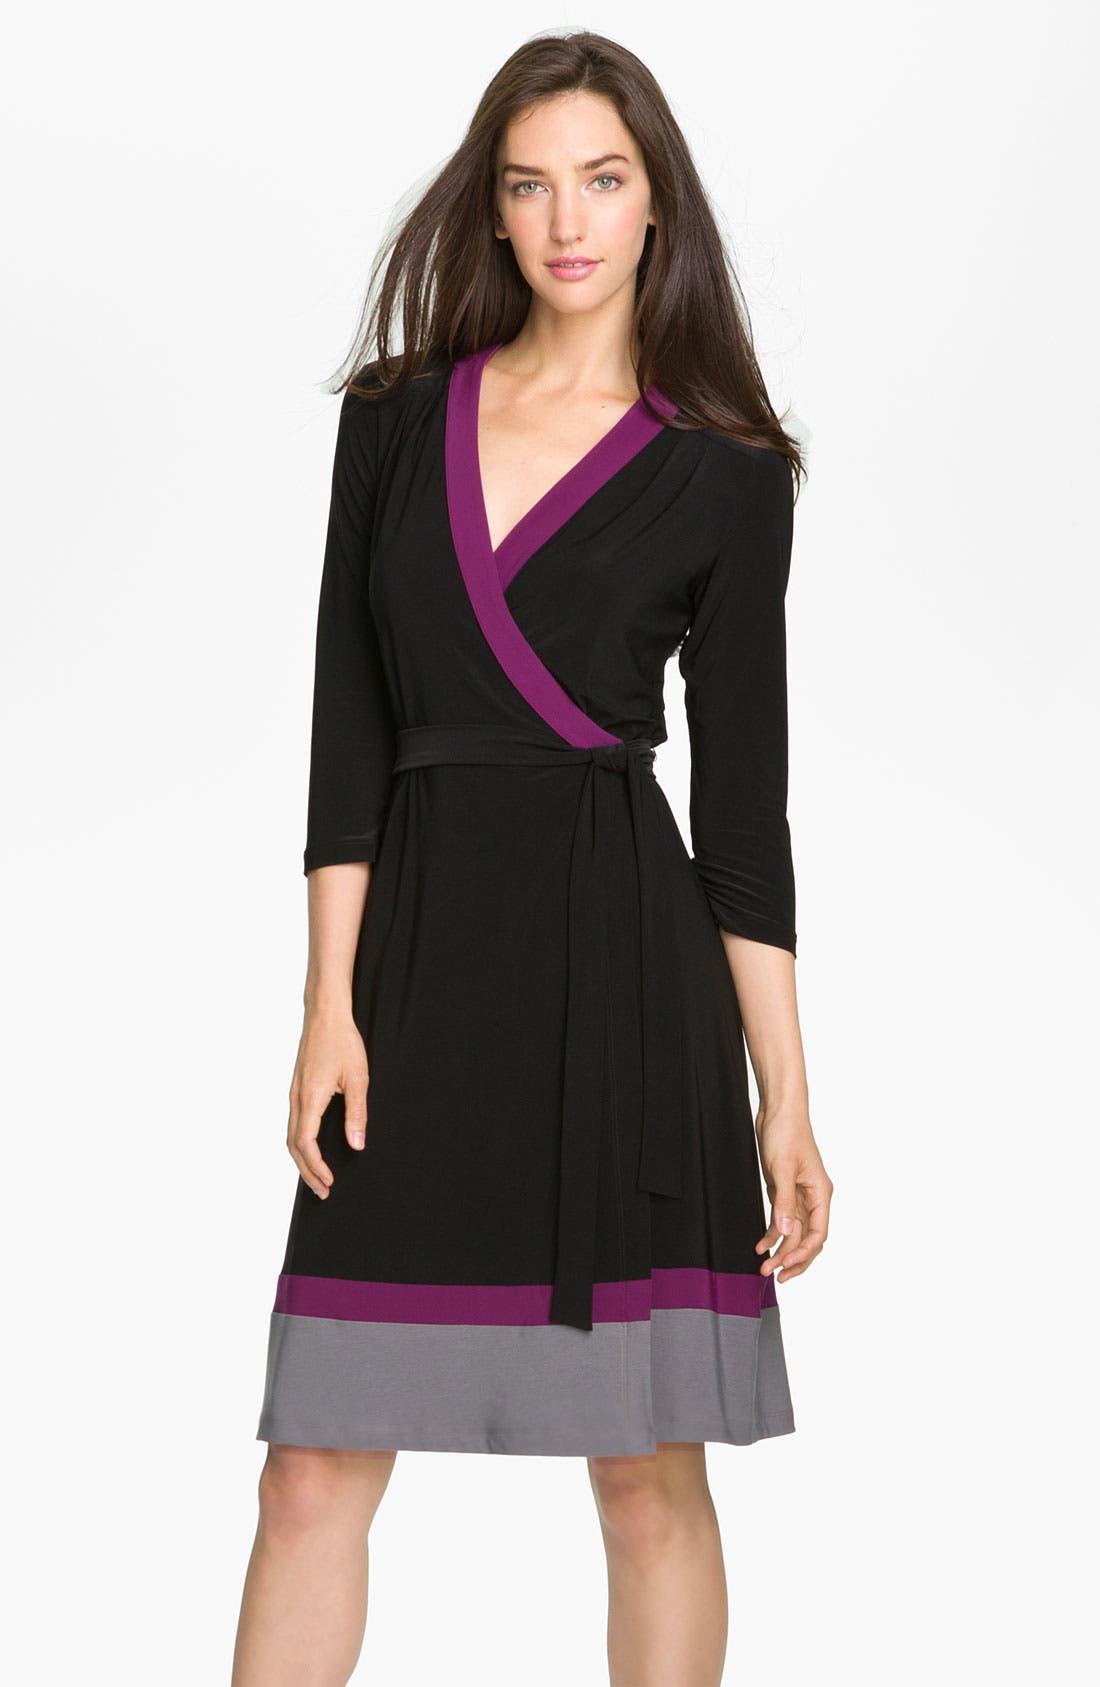 Alternate Image 1 Selected - Alex & Ava Colorblock Jersey Wrap Dress